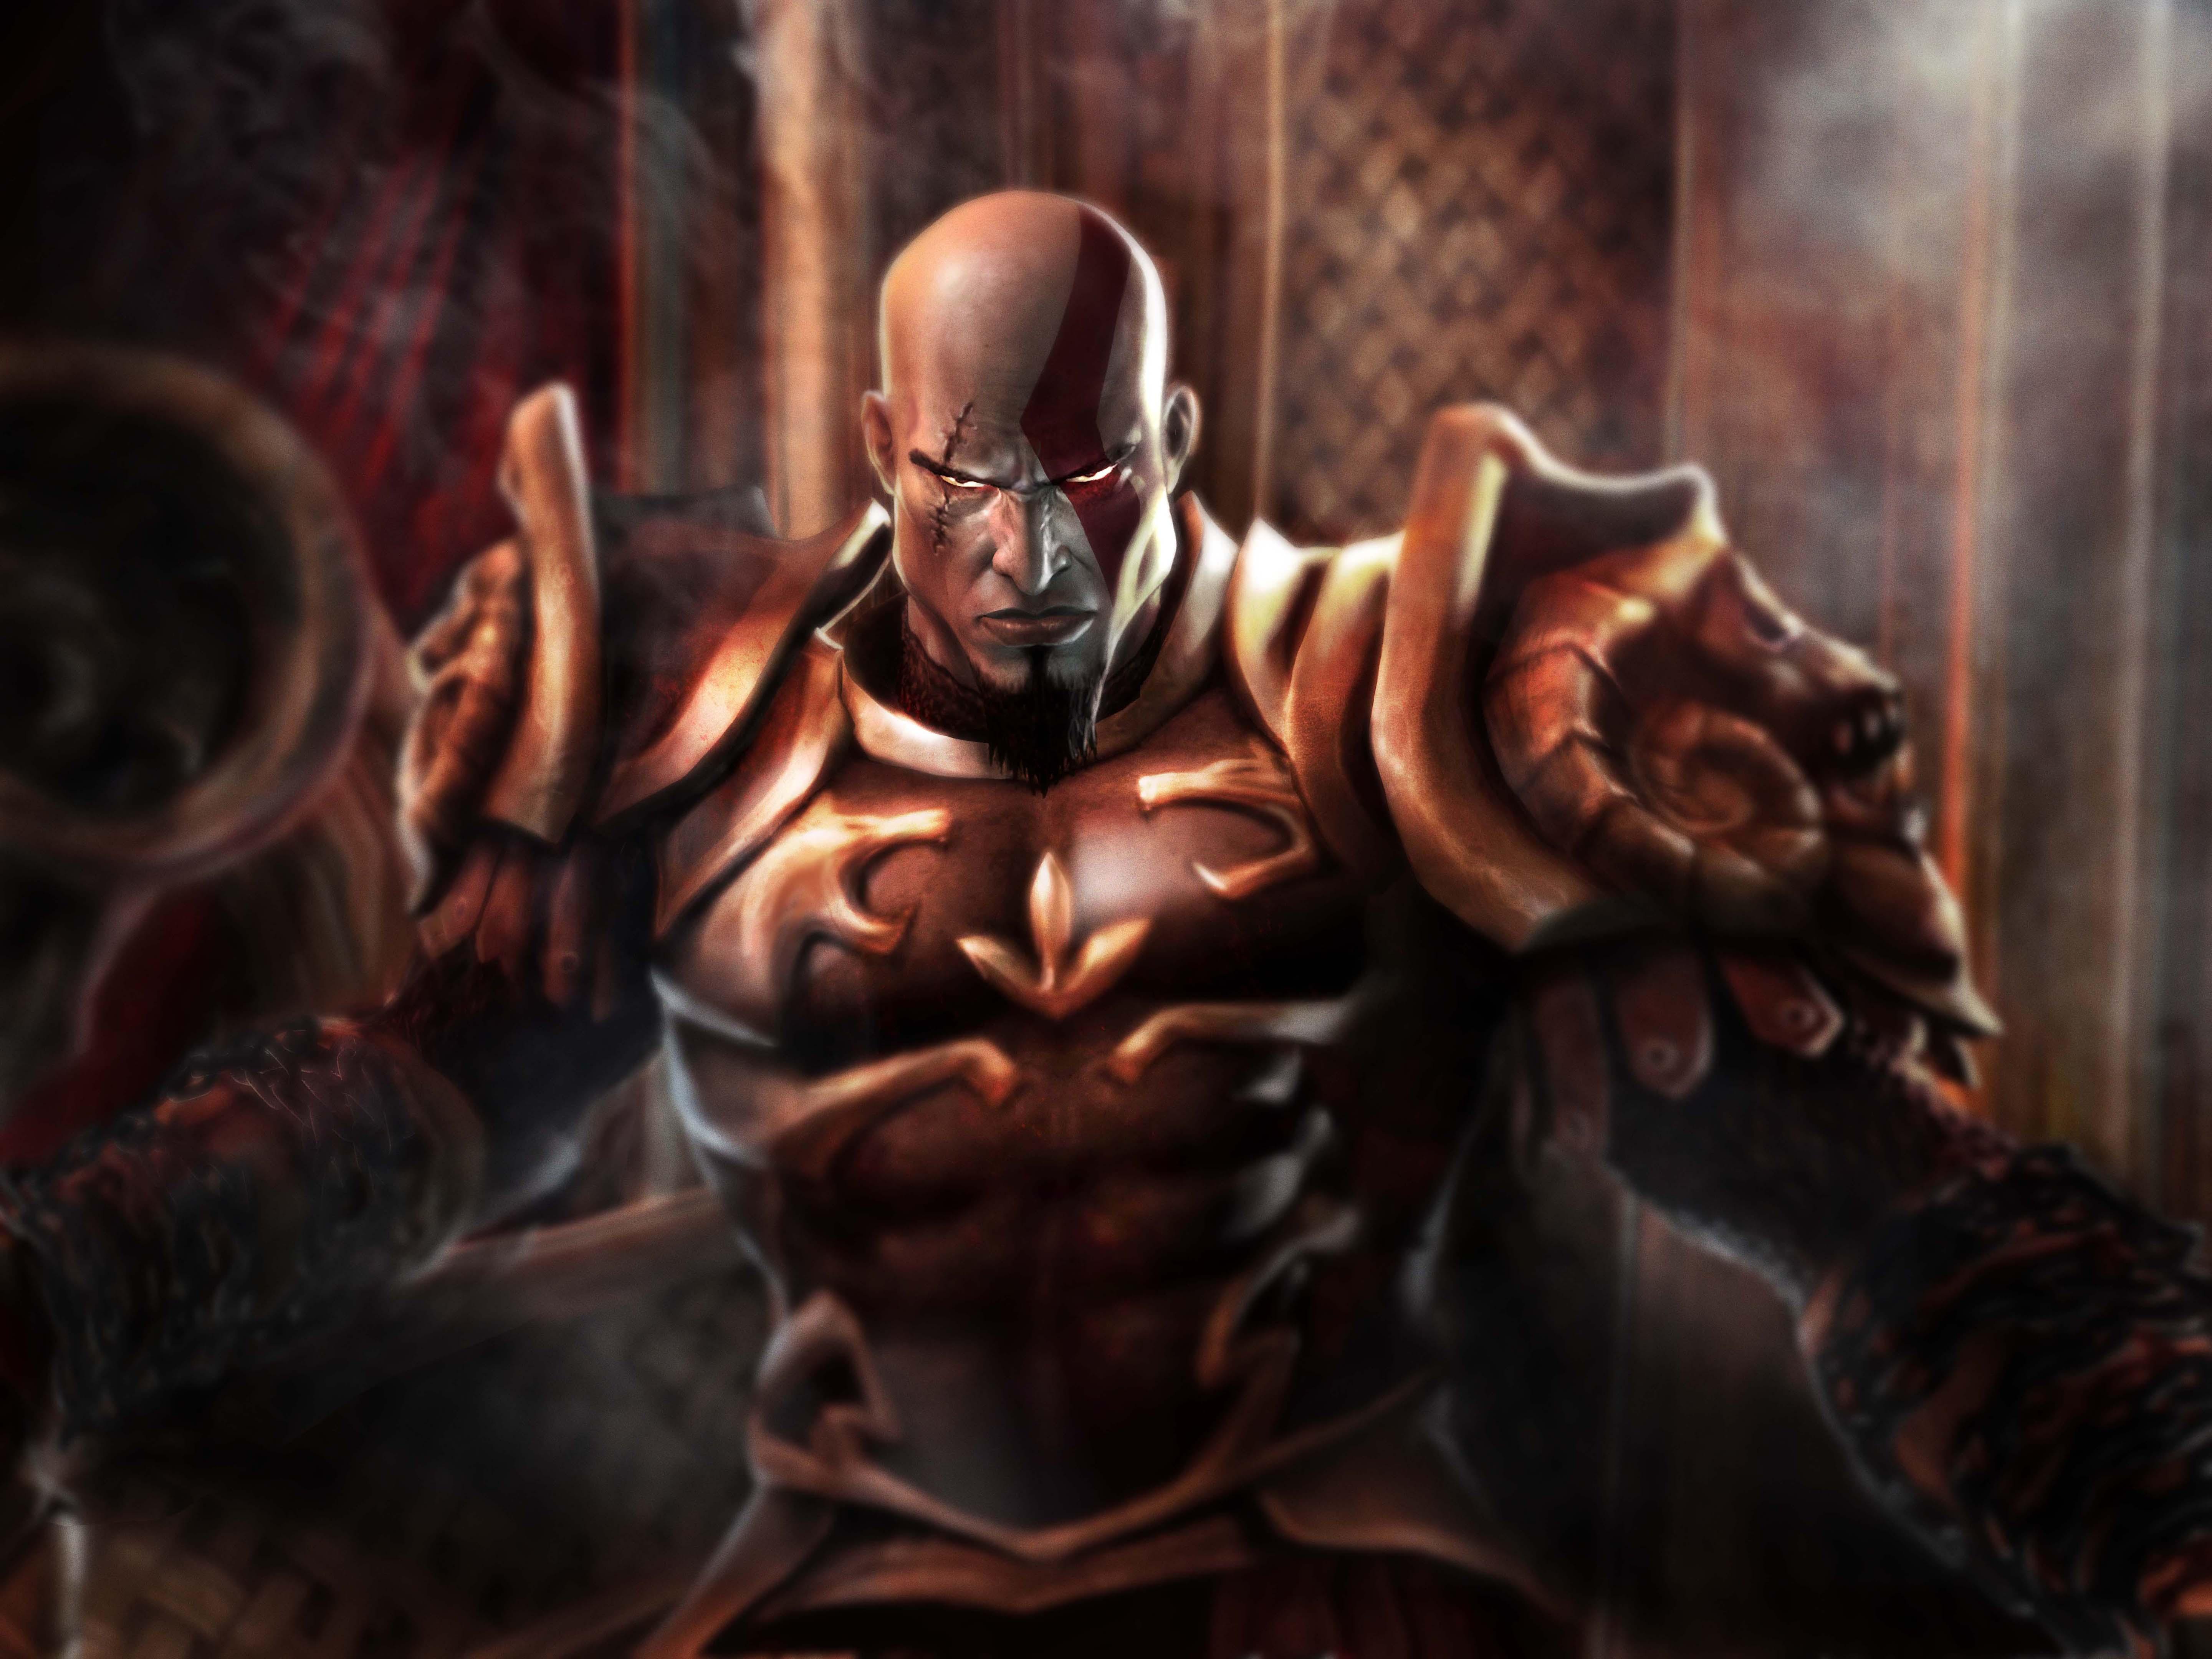 28872_gow2_kratos_throne_122_368lo.jpg